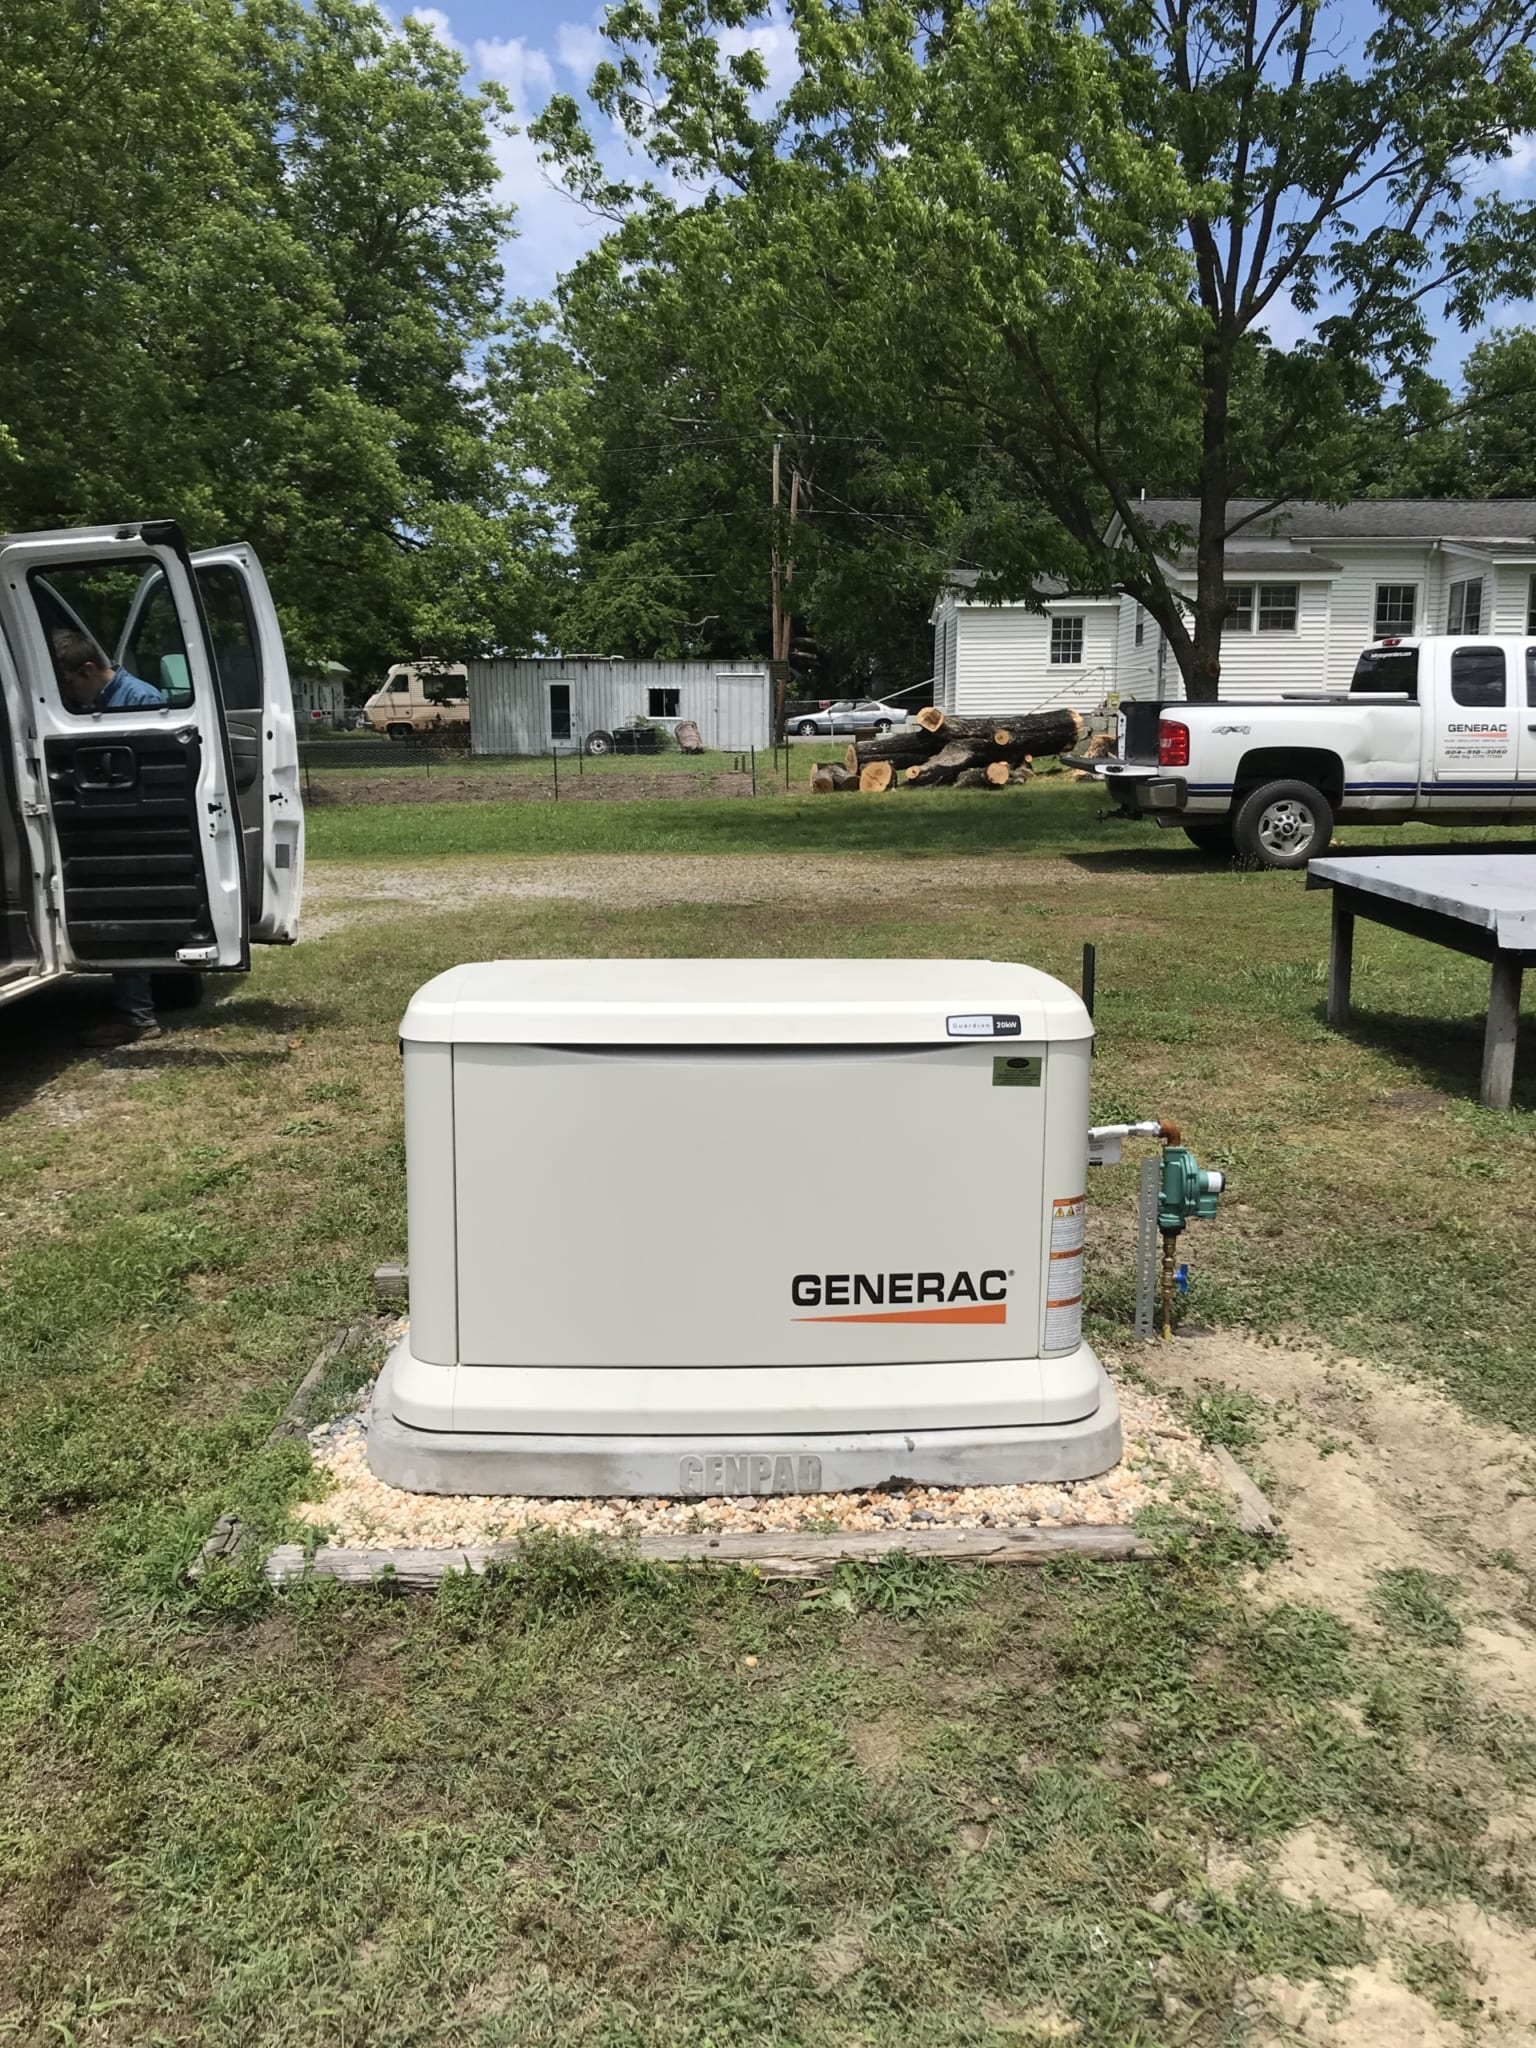 6.2.20 Dinwiddie Generac Automatic Standby Generator